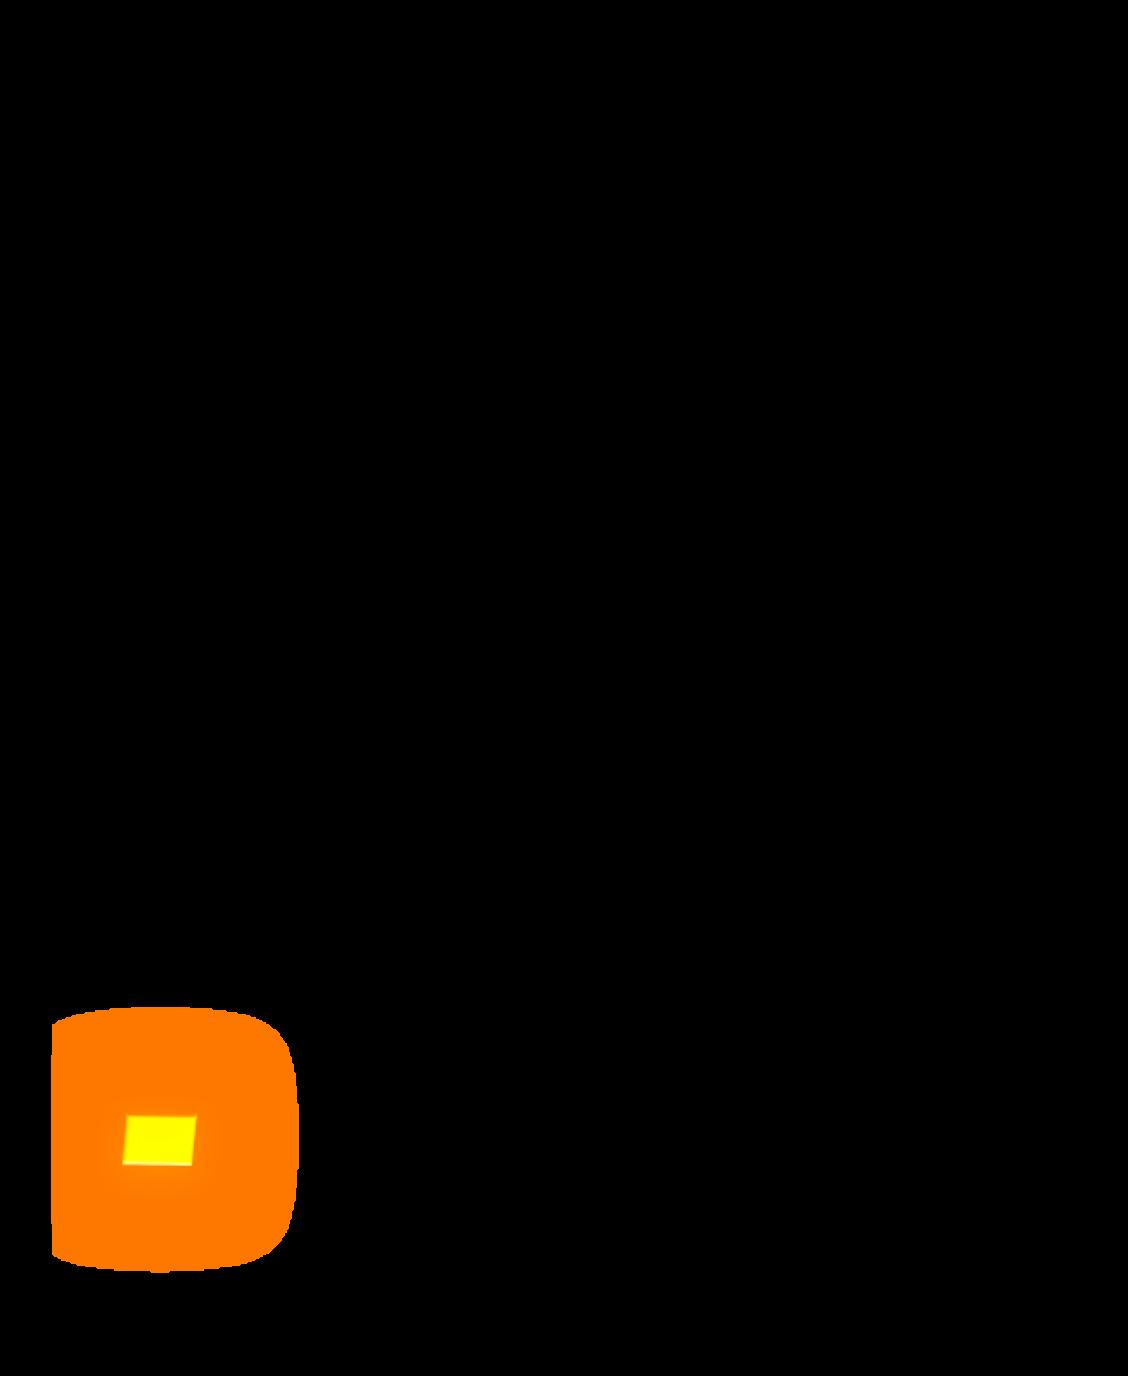 AORUS RTX 2070 GAMING BOX   그래픽카드(VGA) - GIGABYTE Korea